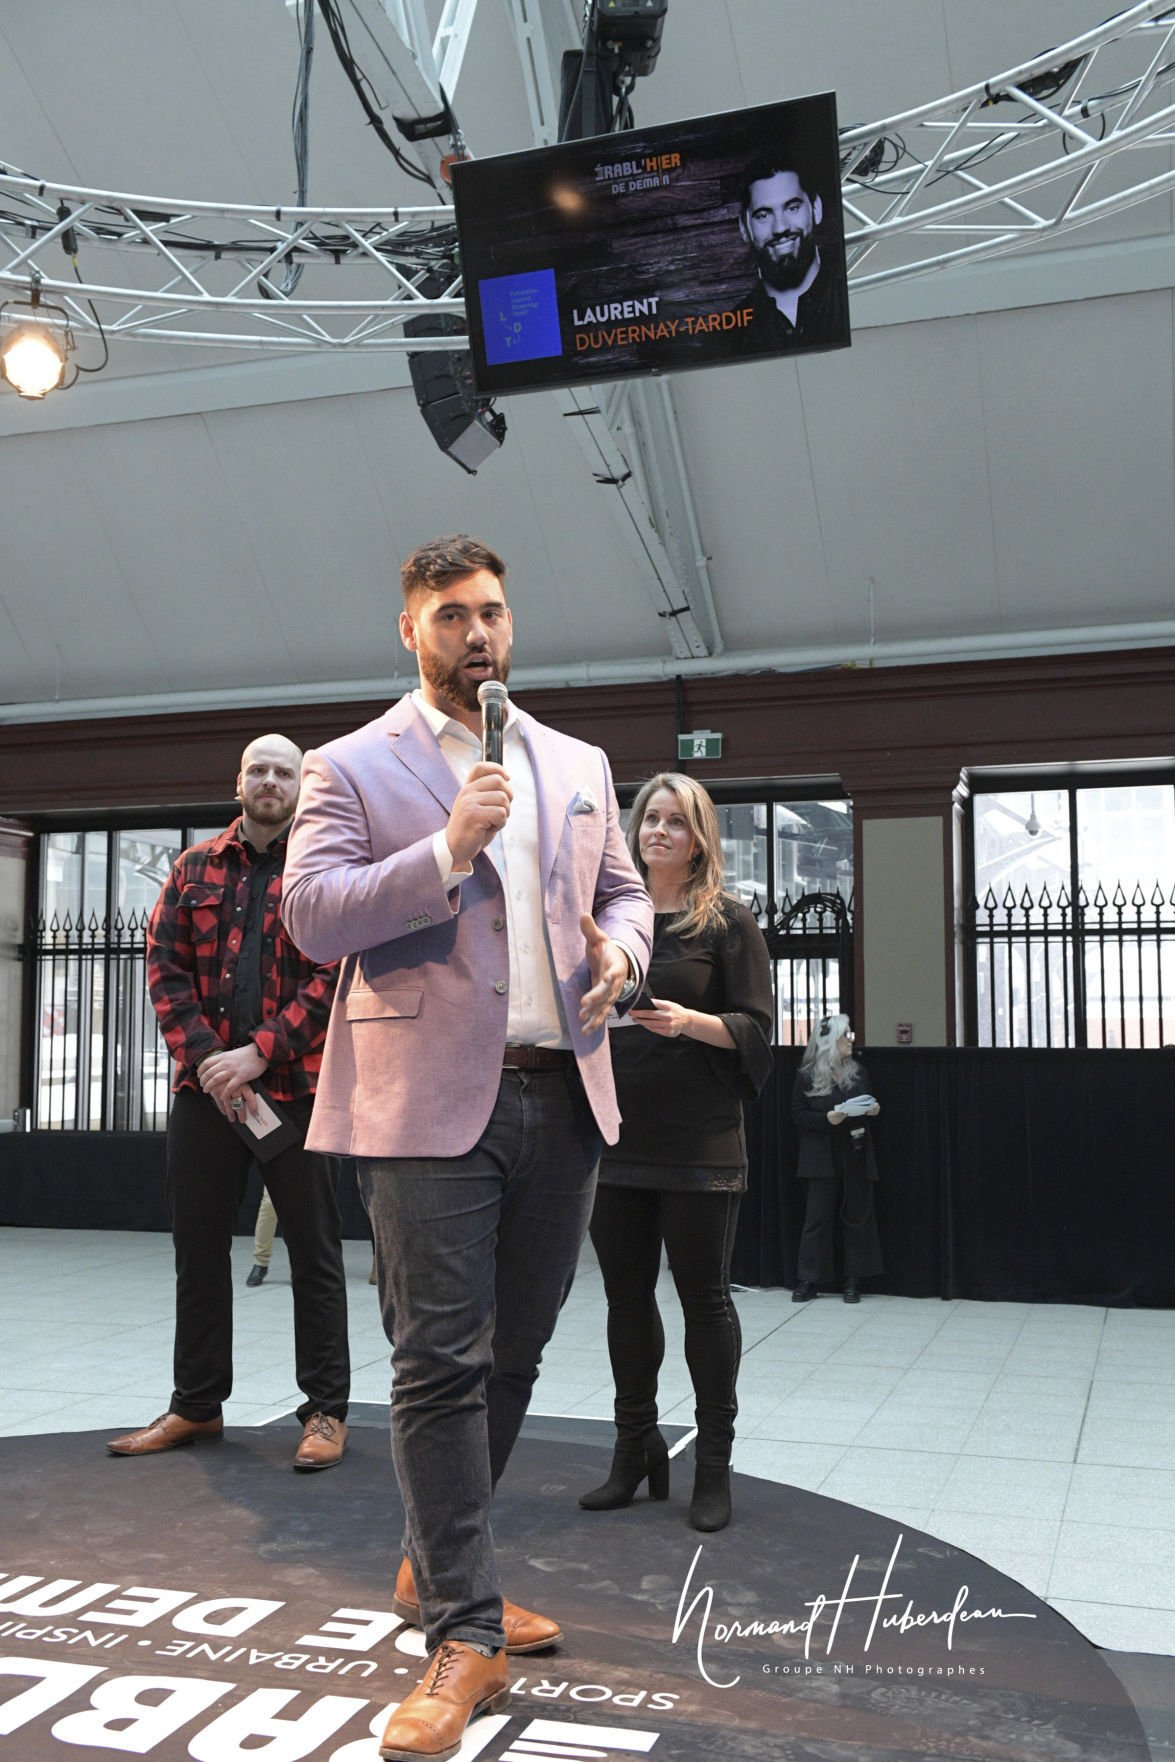 Laurent Duvernay-Tardif Foundation event raises $325,000